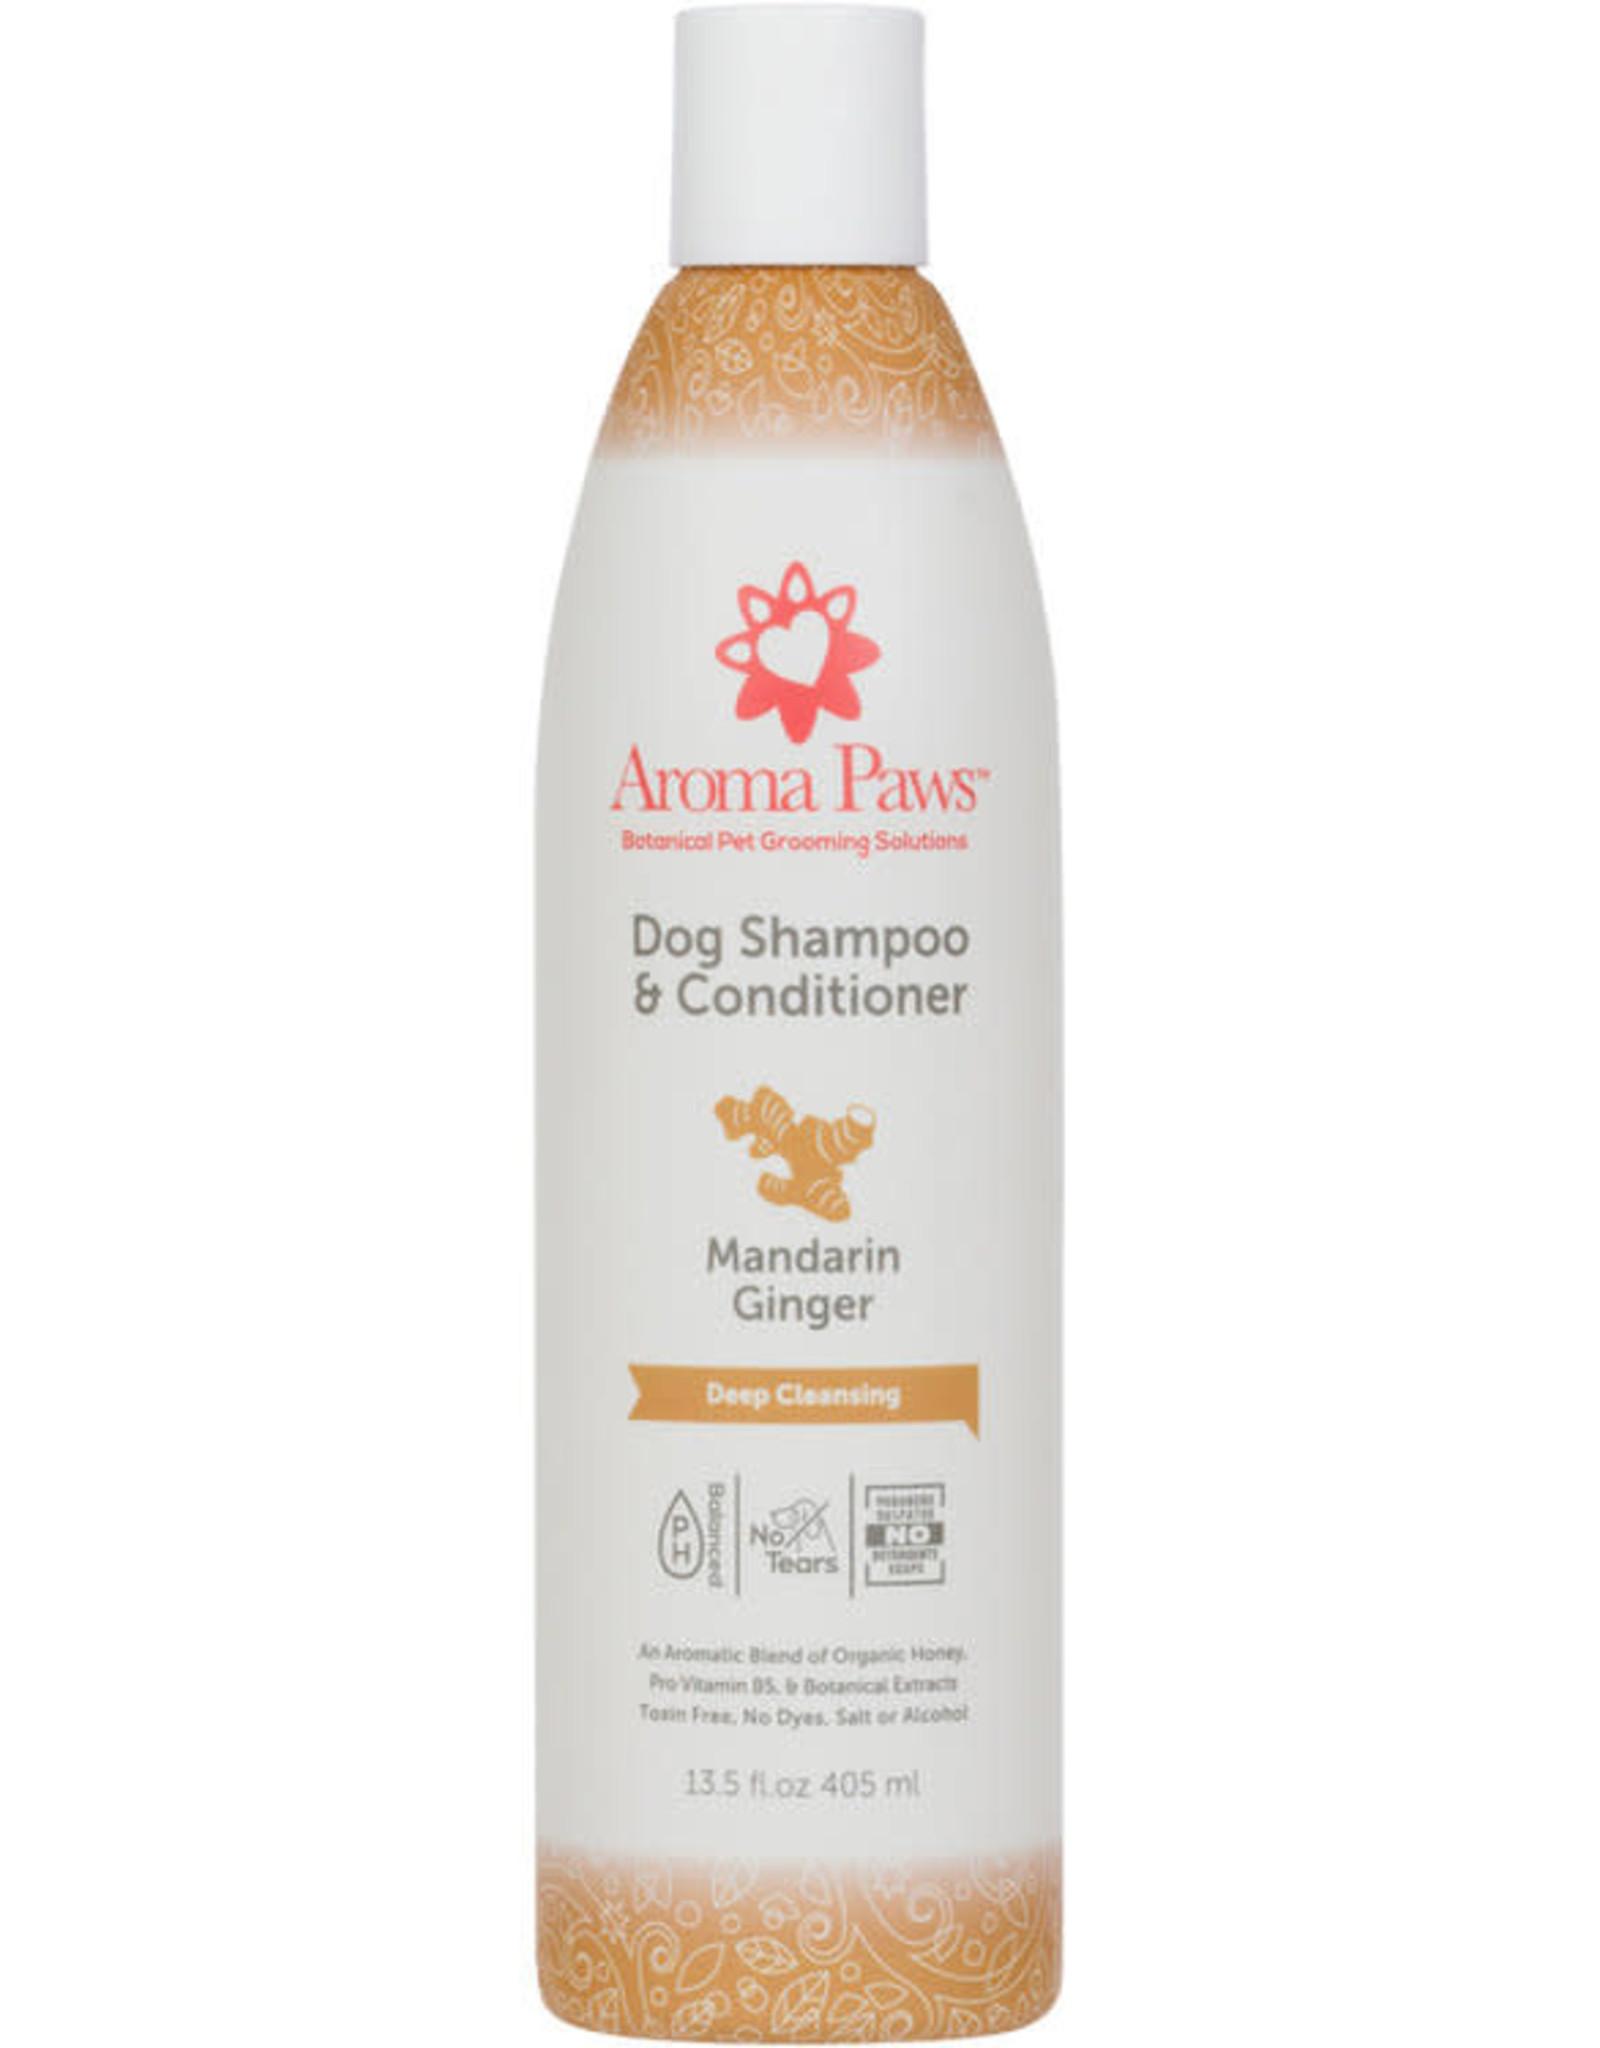 Mandarin Ginger Shampoo & Conditioner 13.5oz